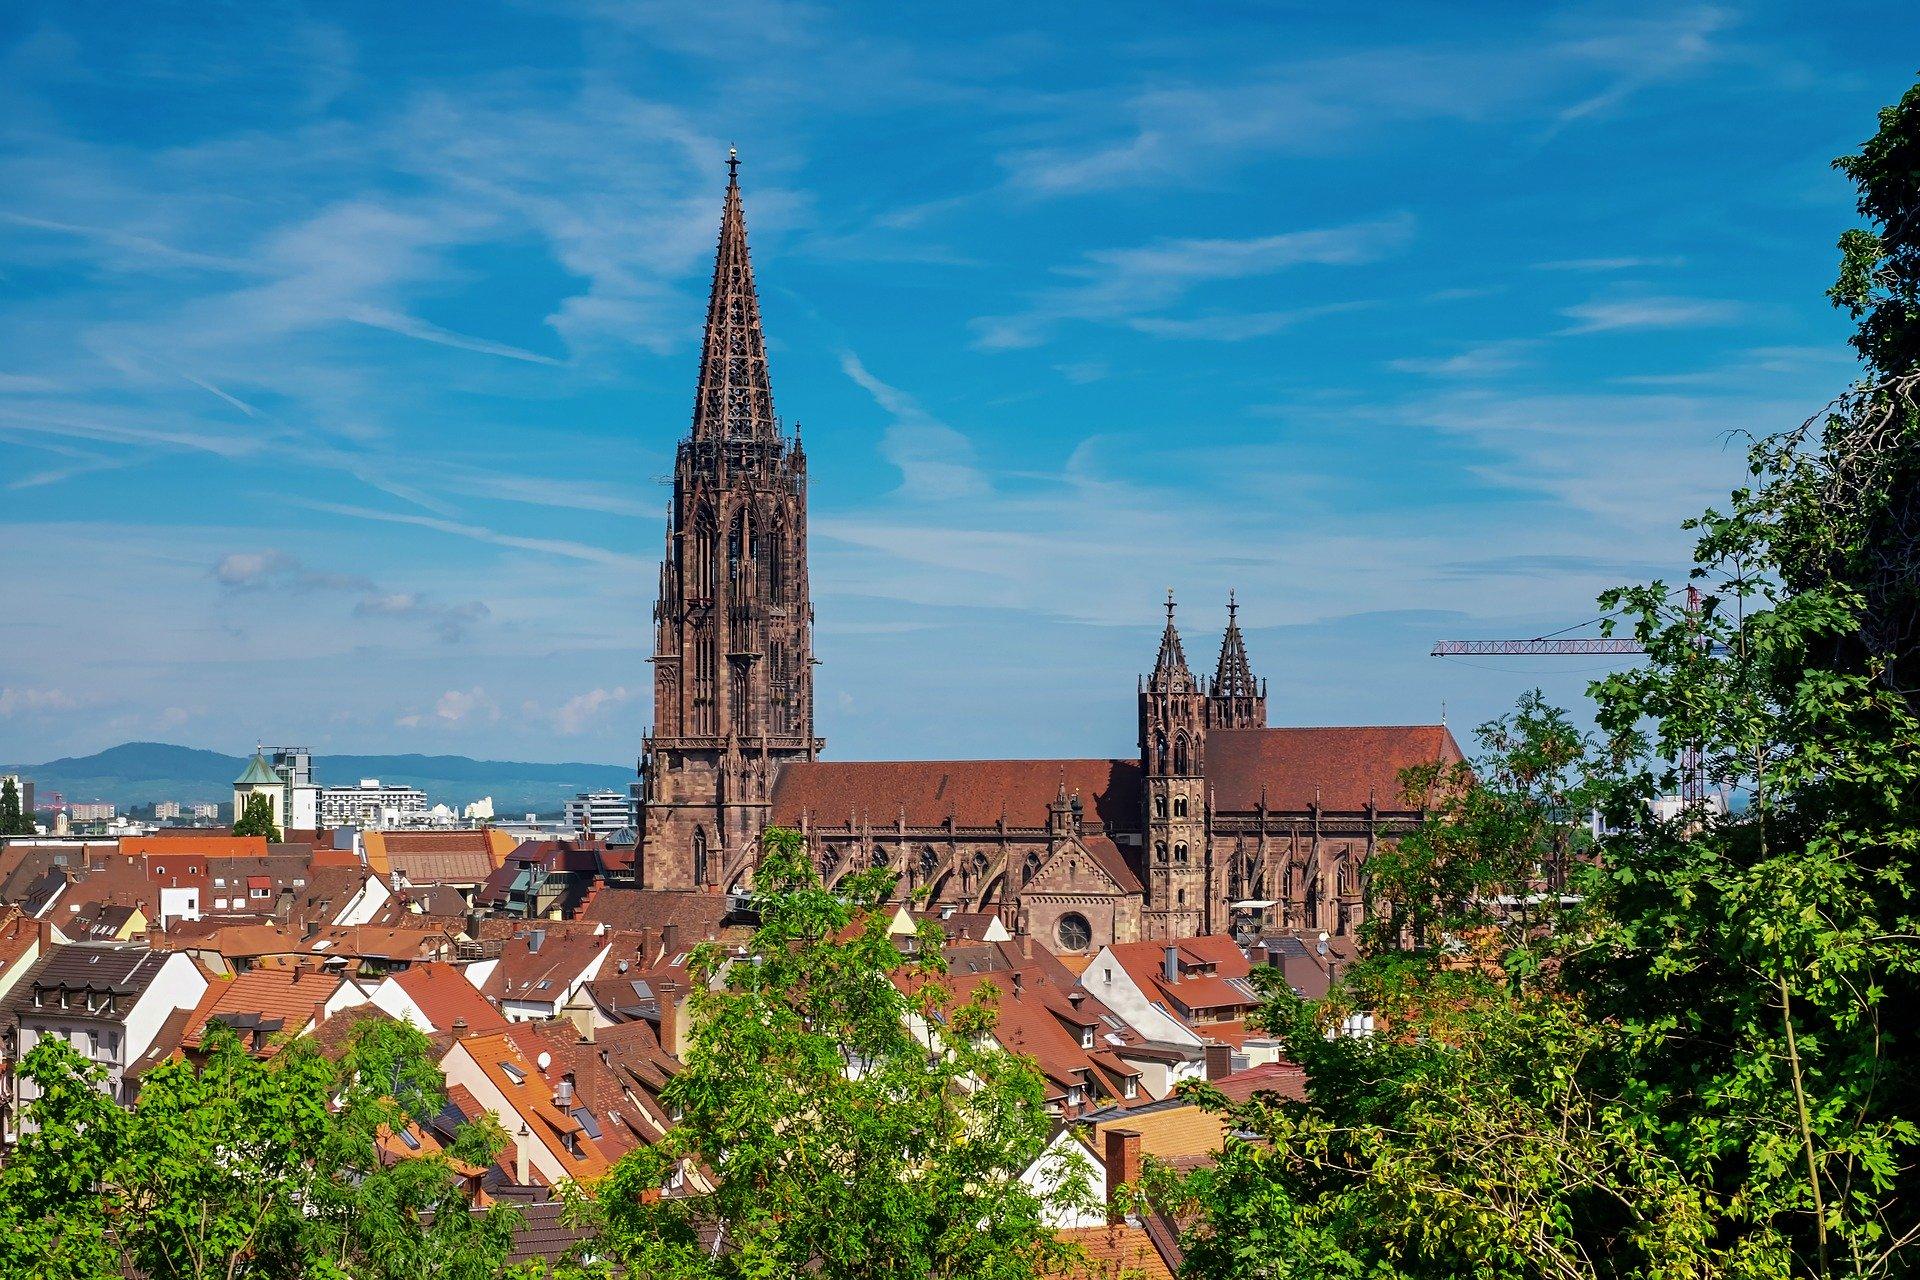 Grillplätze In Köln